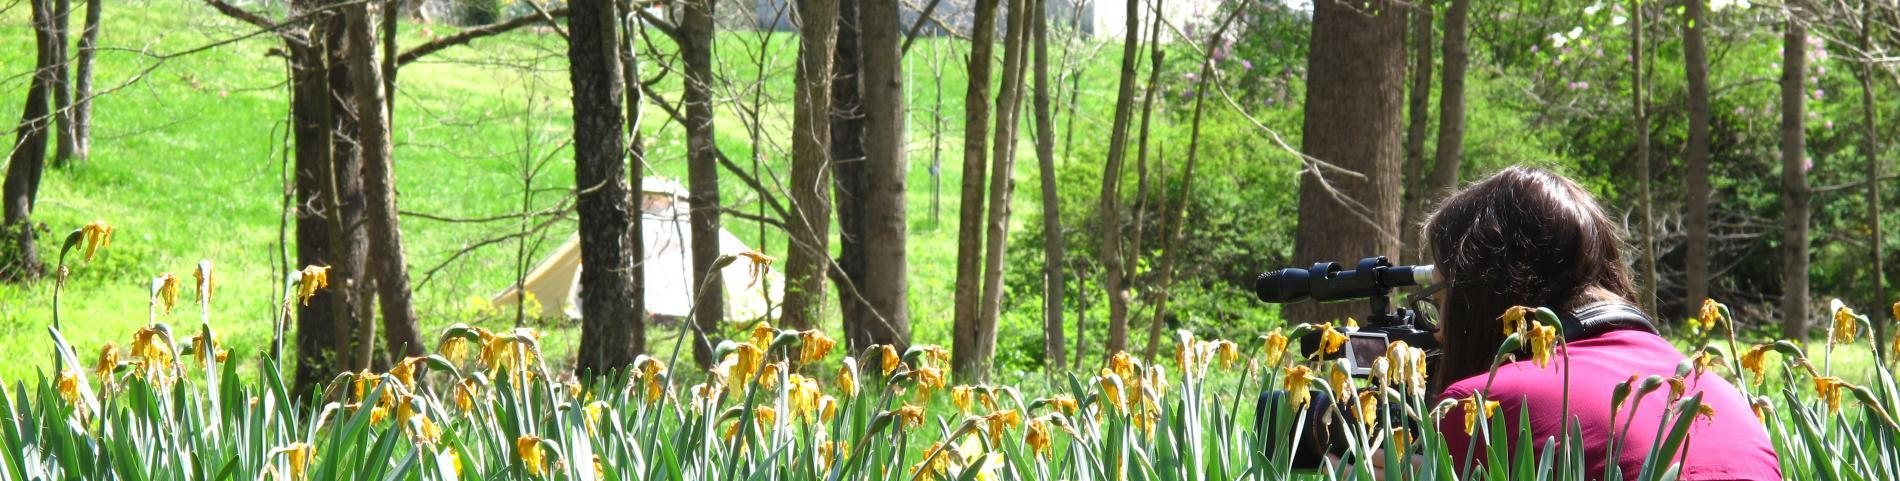 FMA Student Capturing Nature on Film